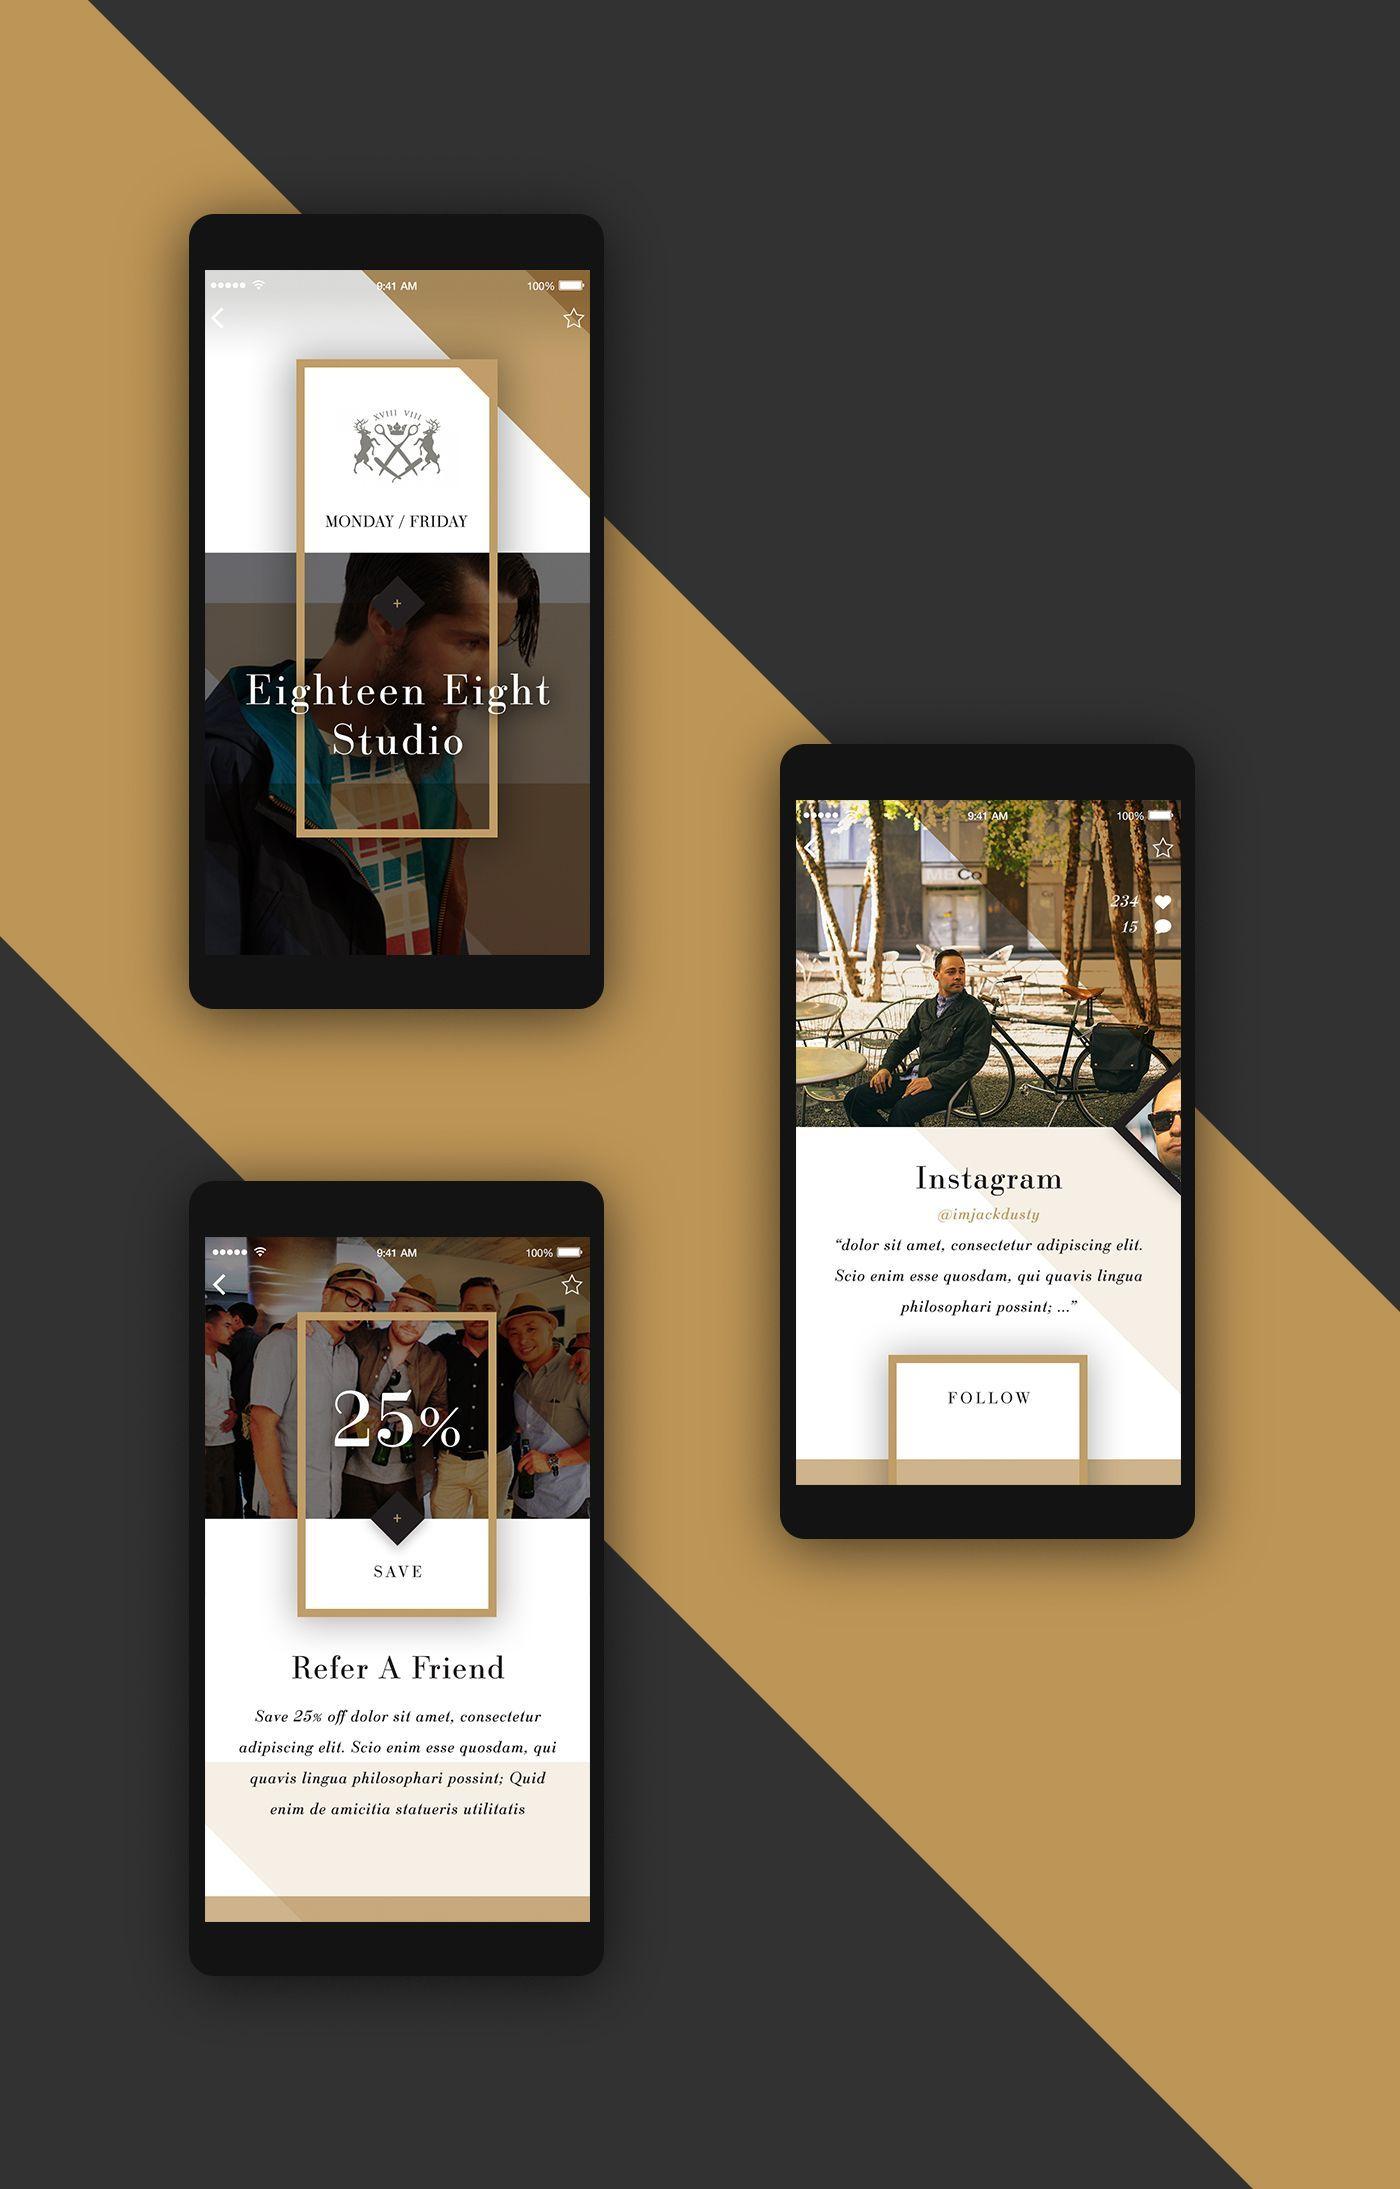 All Gold Evetuthing – Ui design concept for mobile app by Elegant